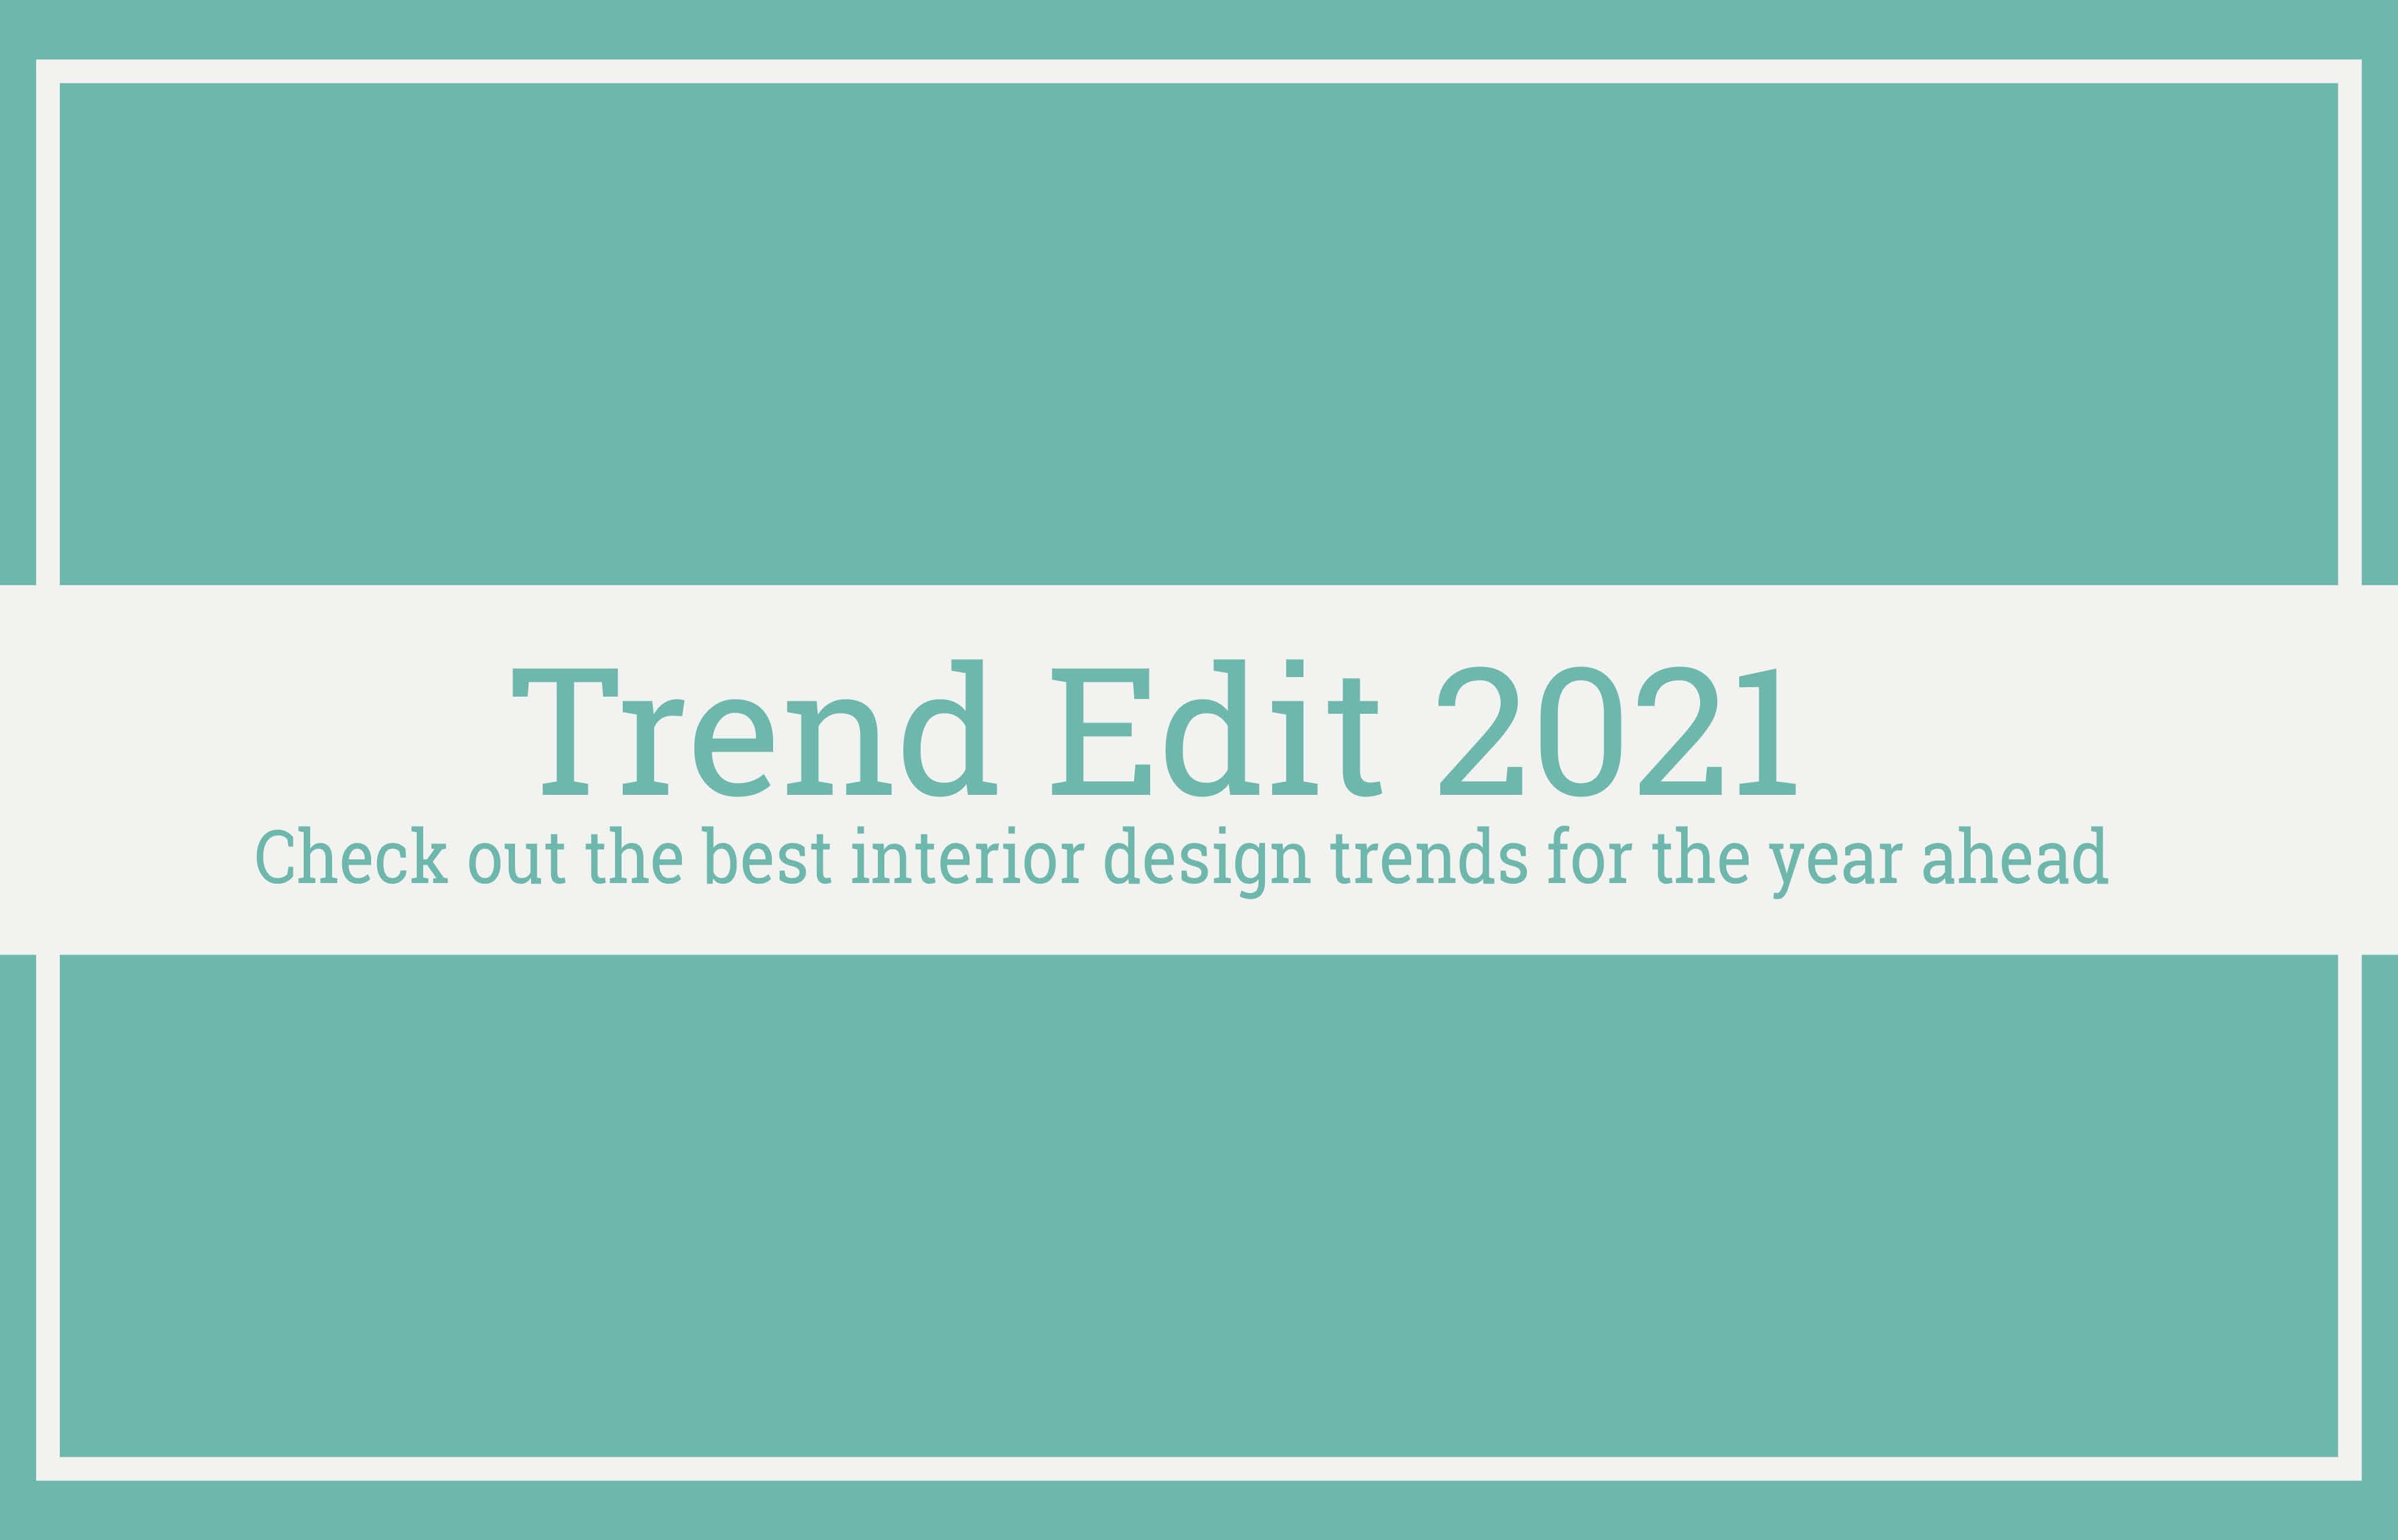 Trend Edit